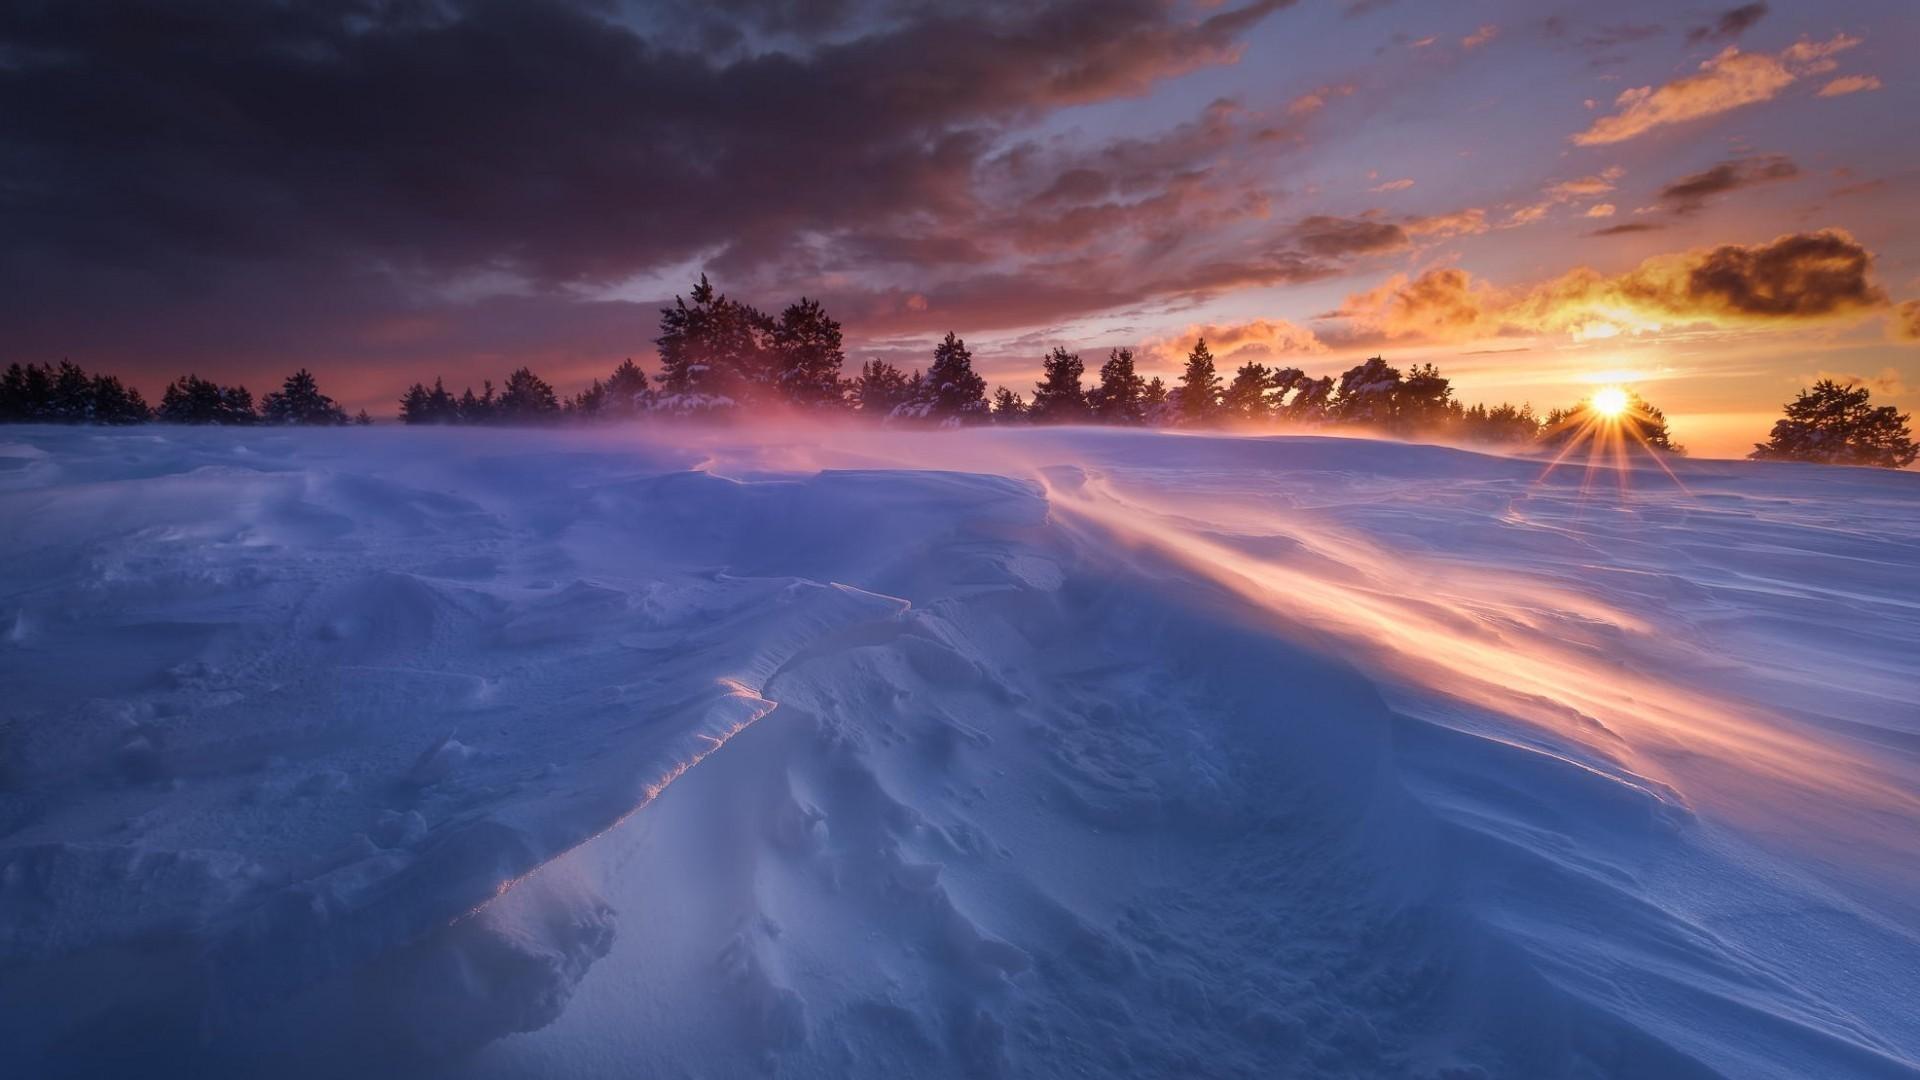 Cold Picture